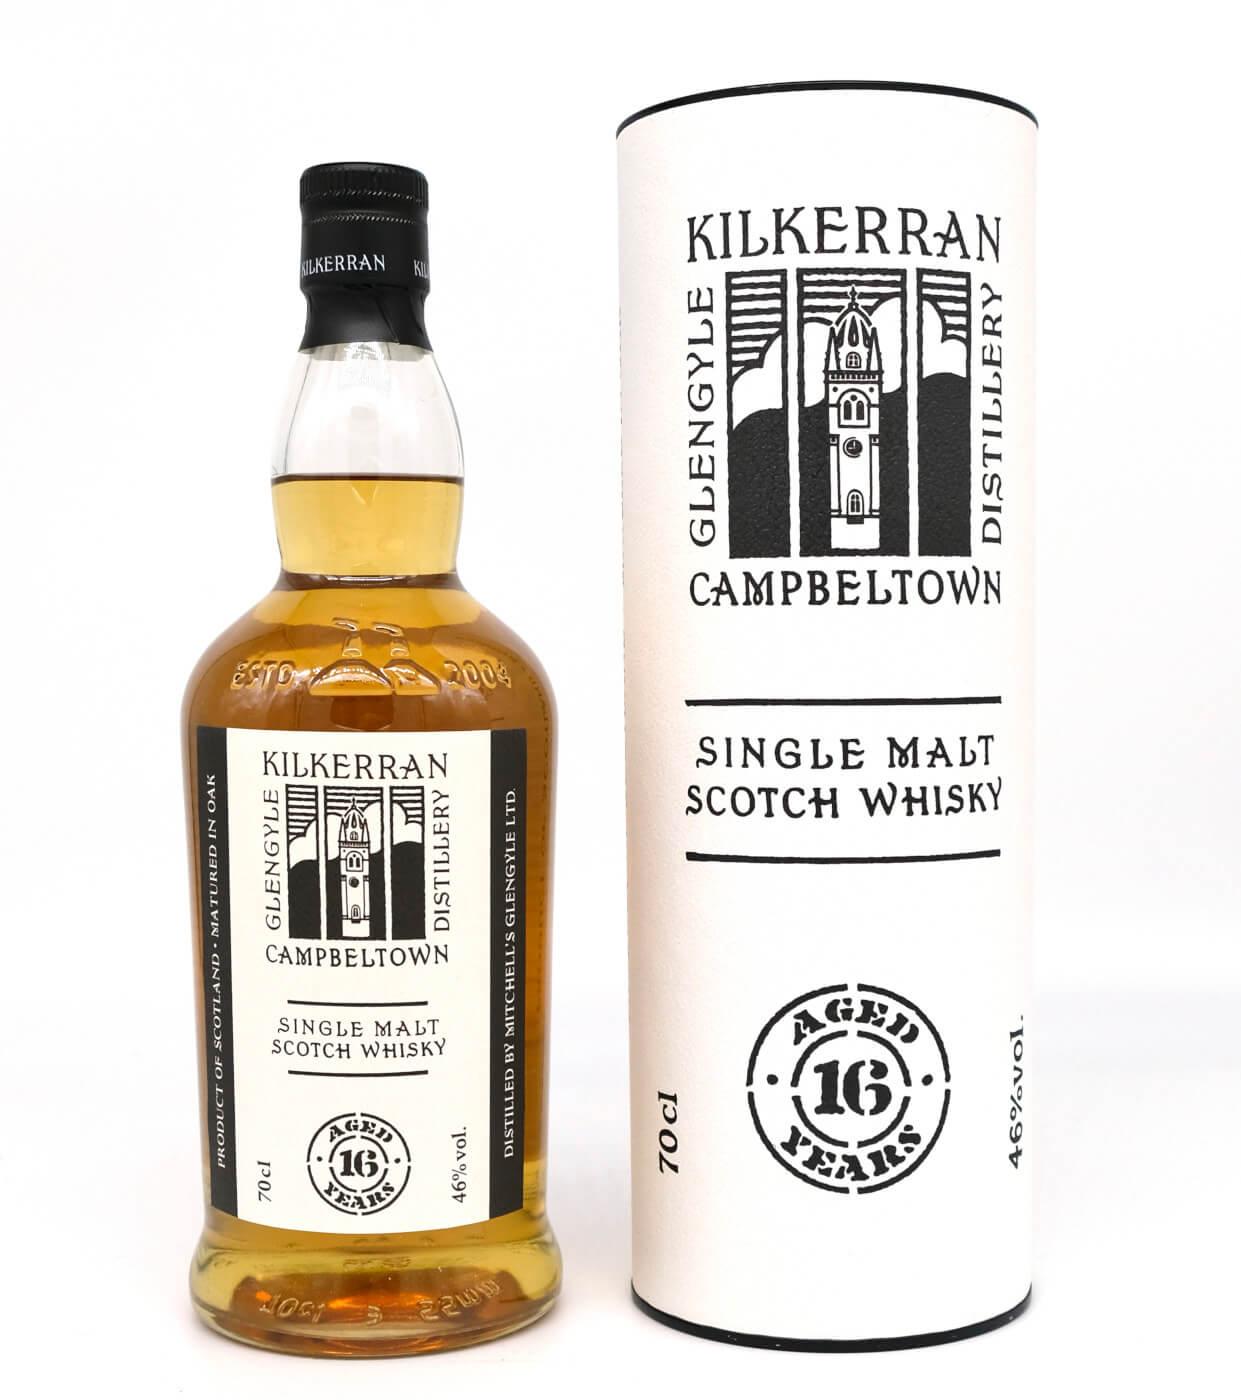 Kilkerran Campbeltown Whisky